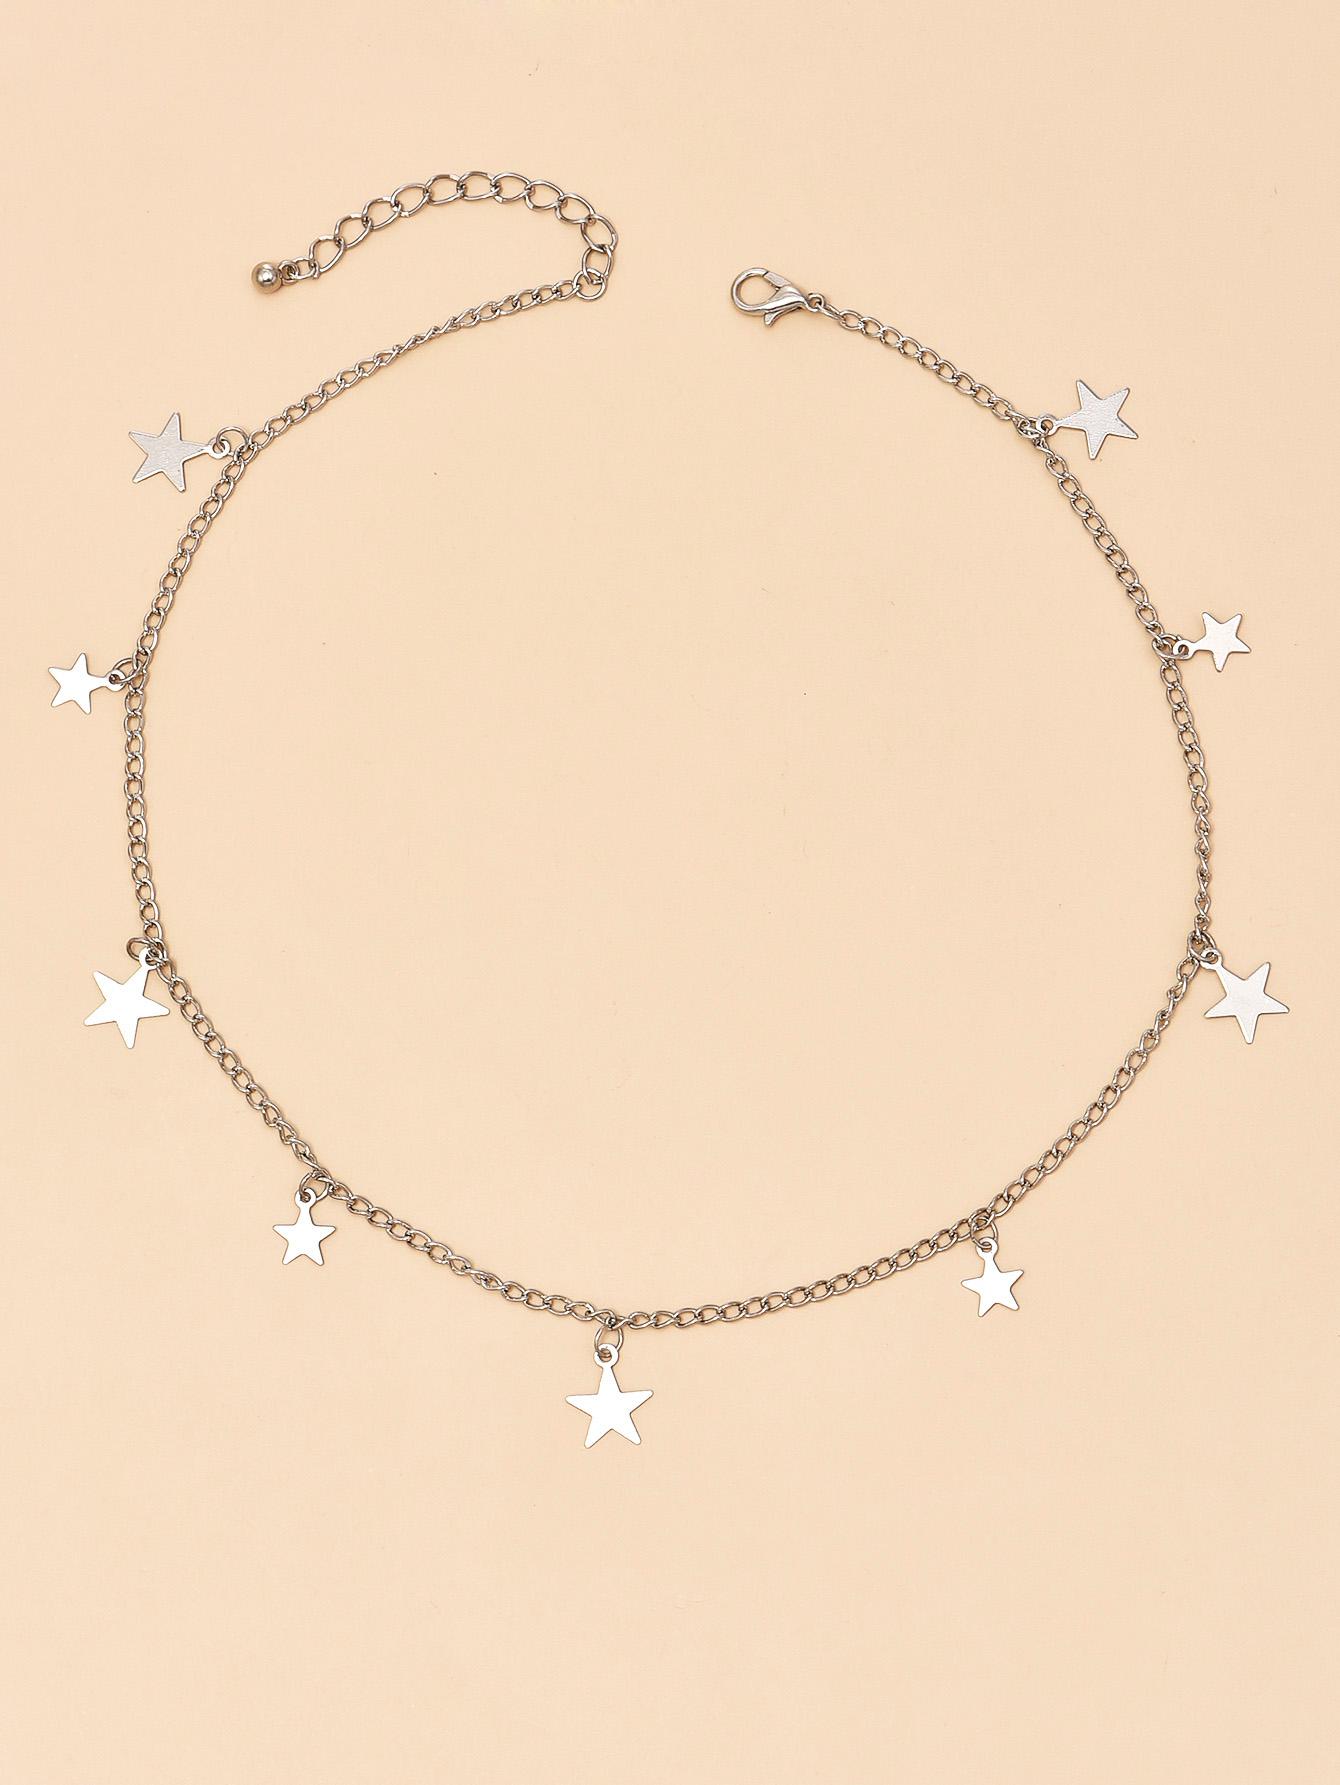 fashion new stars women's necklace wholesale nihaojewelry NHAJ253439